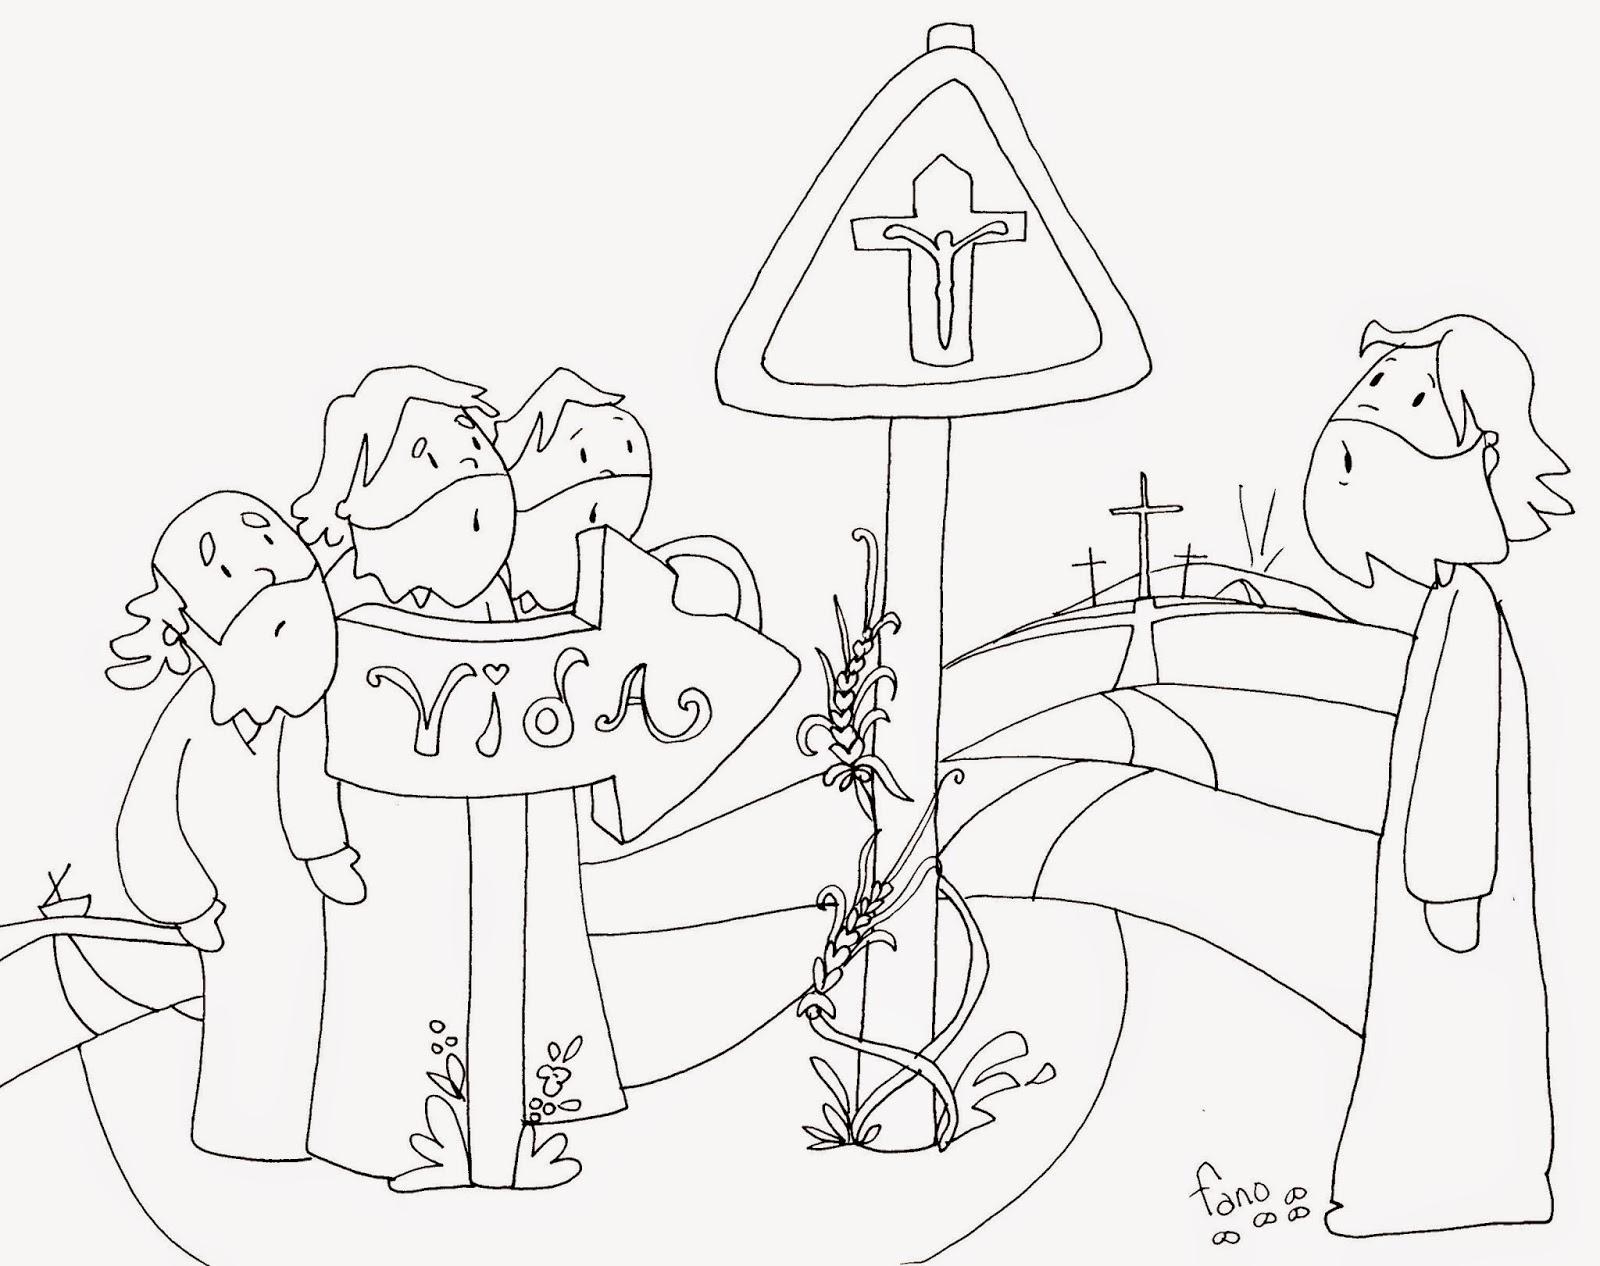 foto de La Catequesis (El blog de Sandra): Dibujos de Patxi Fano